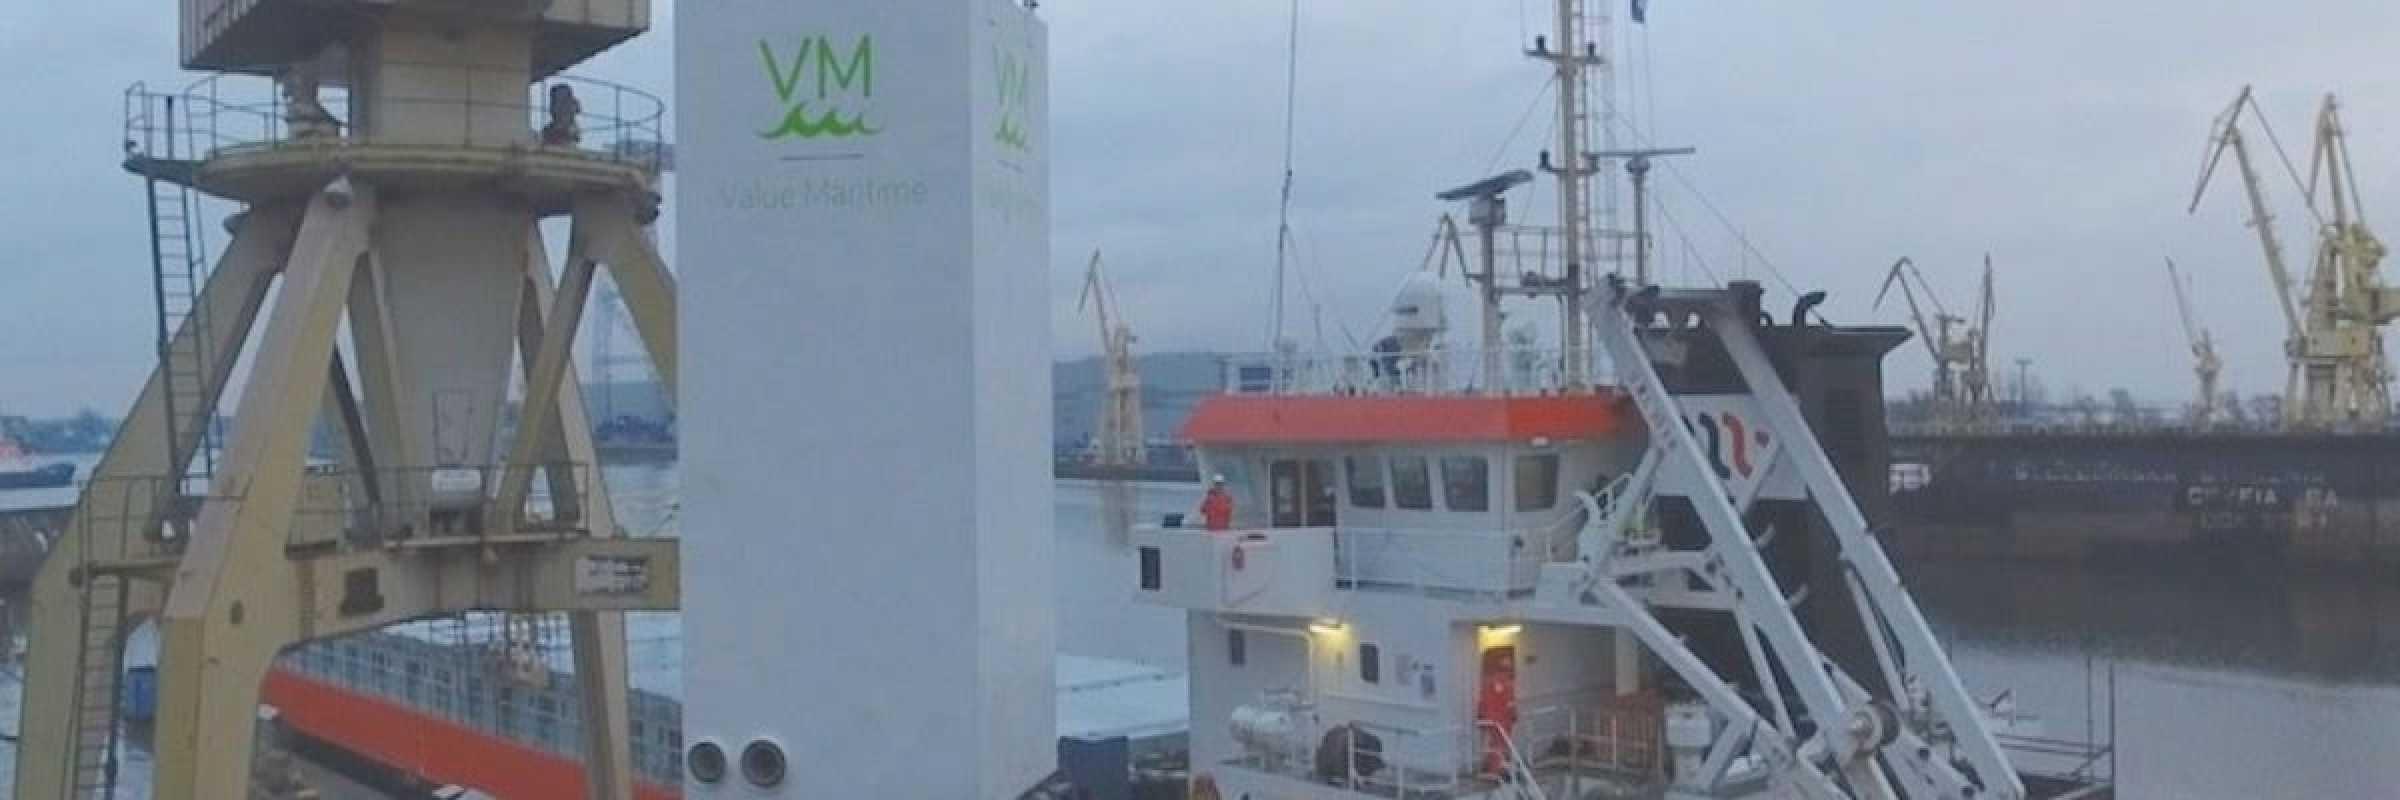 Value Maritime modular scrubber gets LR nod